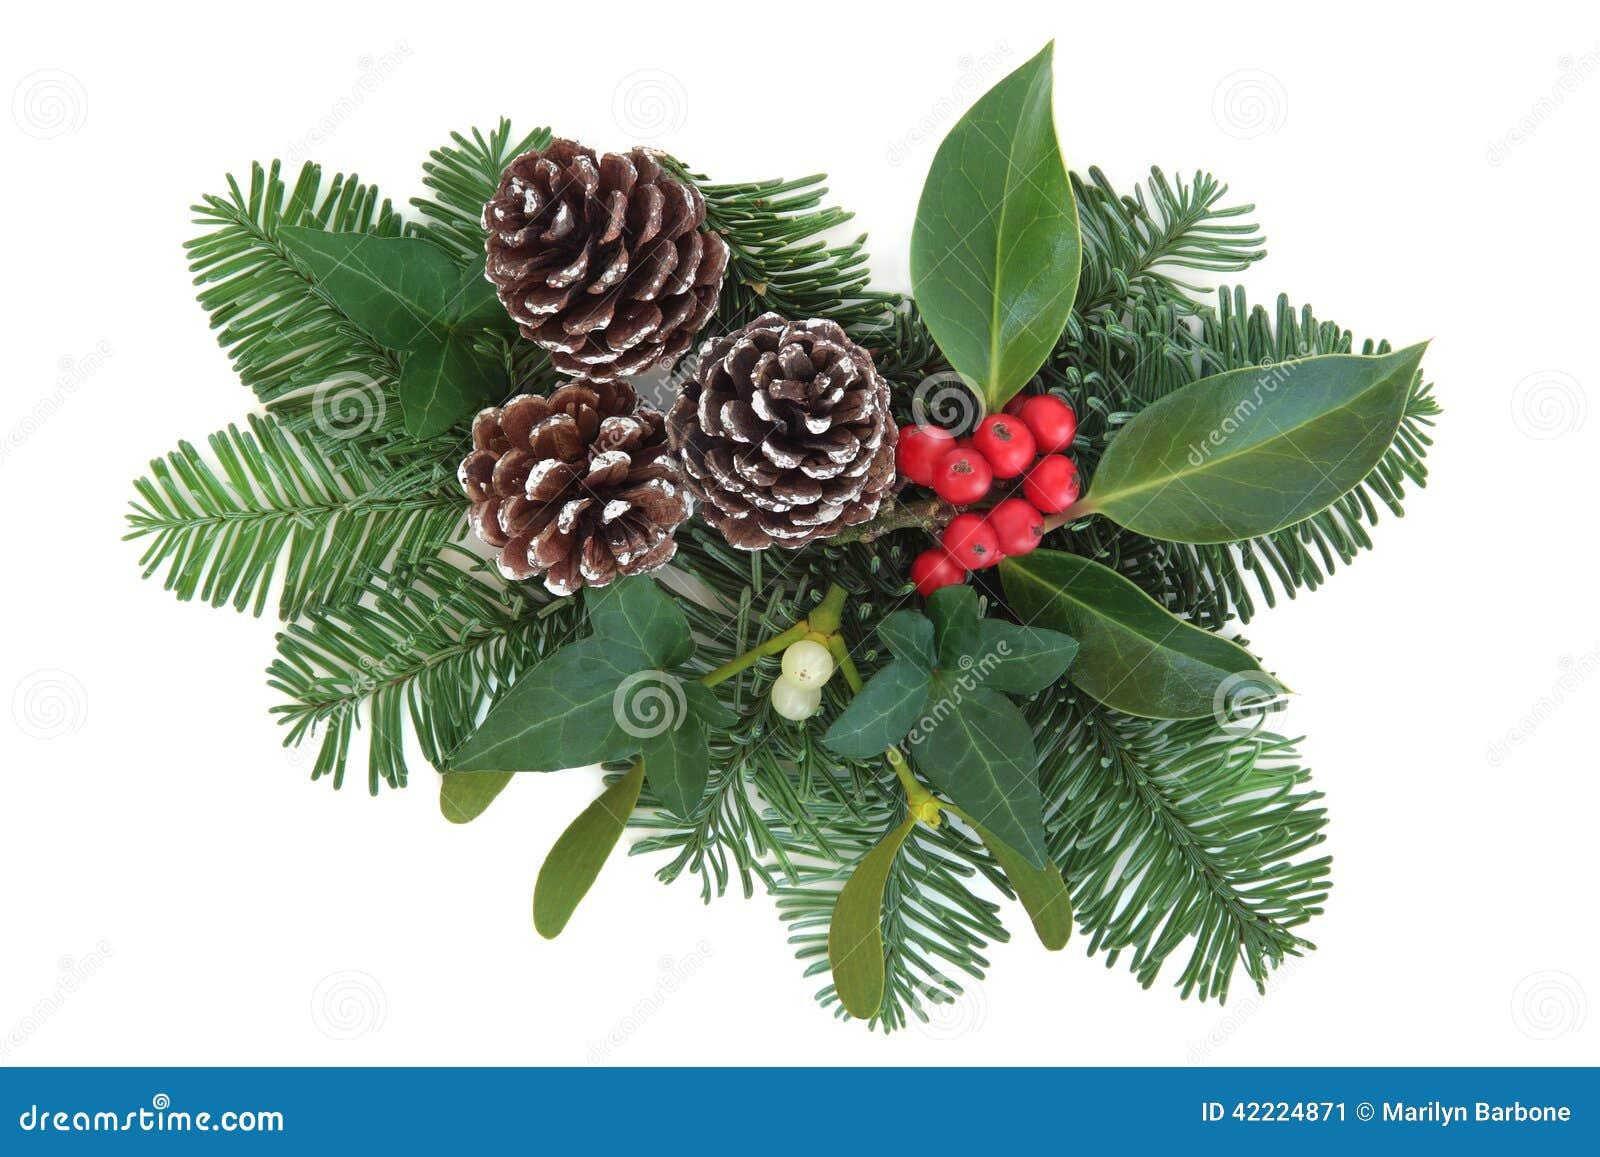 winter greenery stock photo